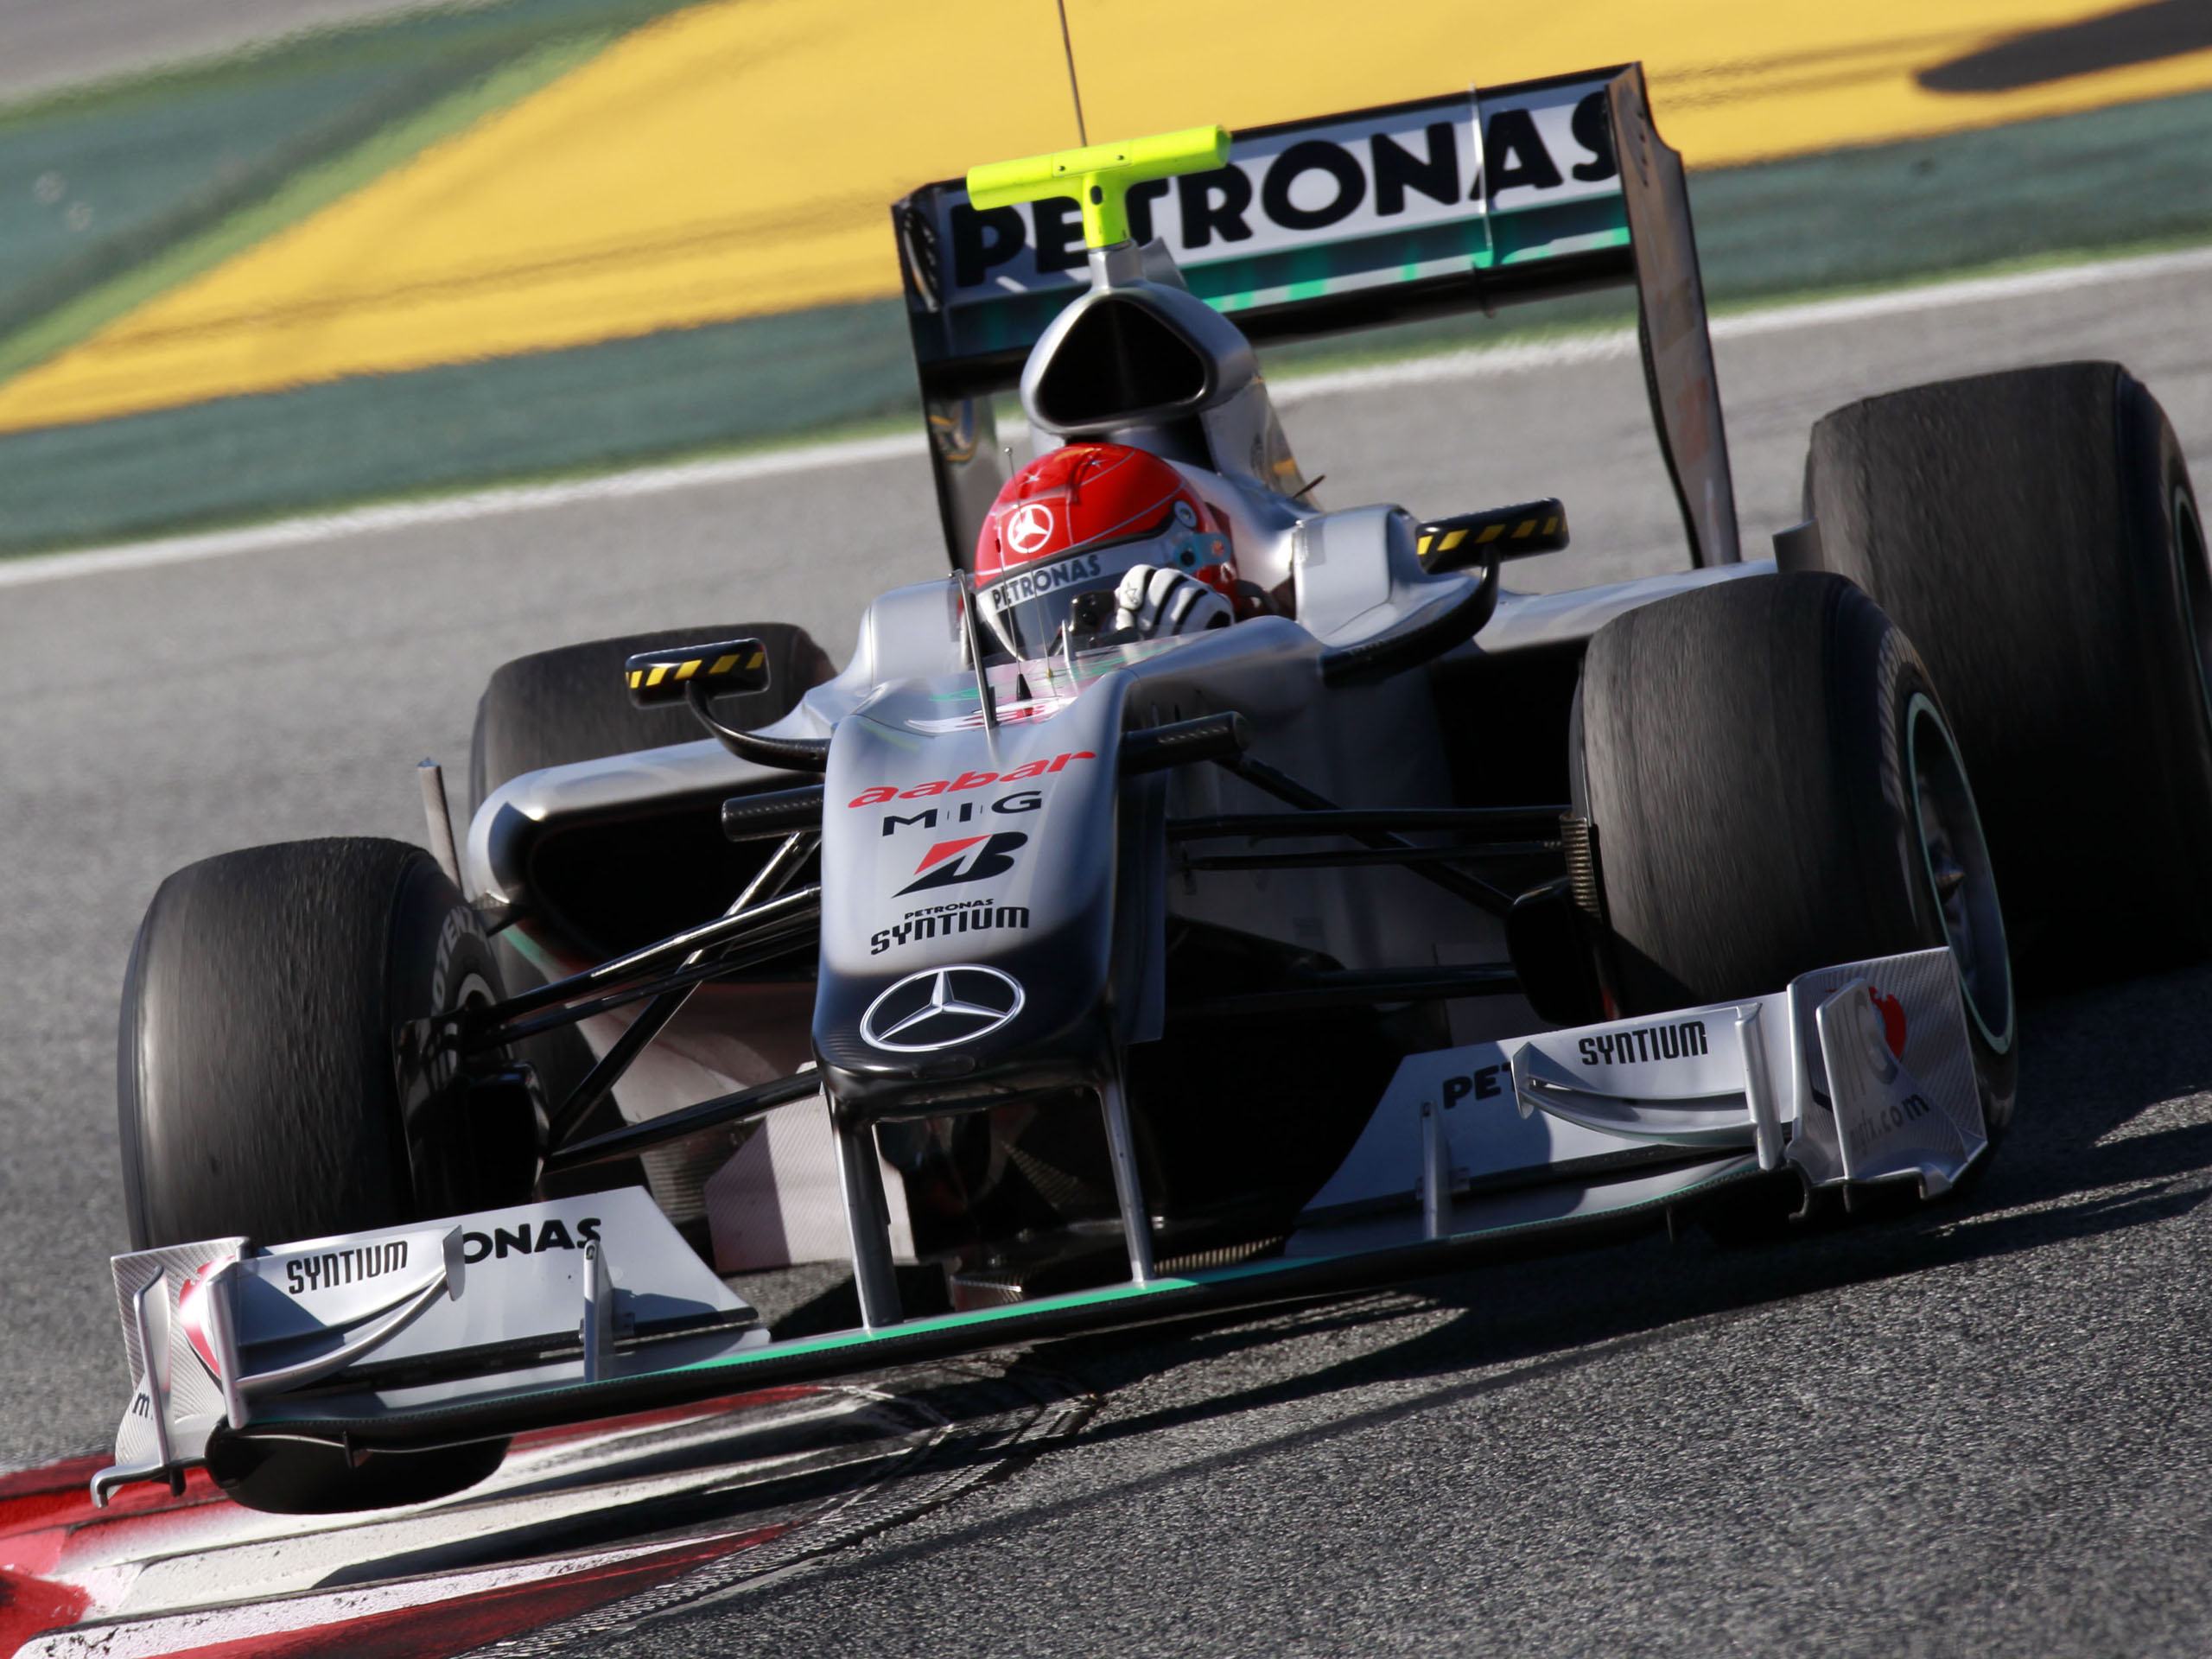 Schumacher Mercedes F1 Full Hd Wallpaper: Michael Schumacher In Mercedes GP